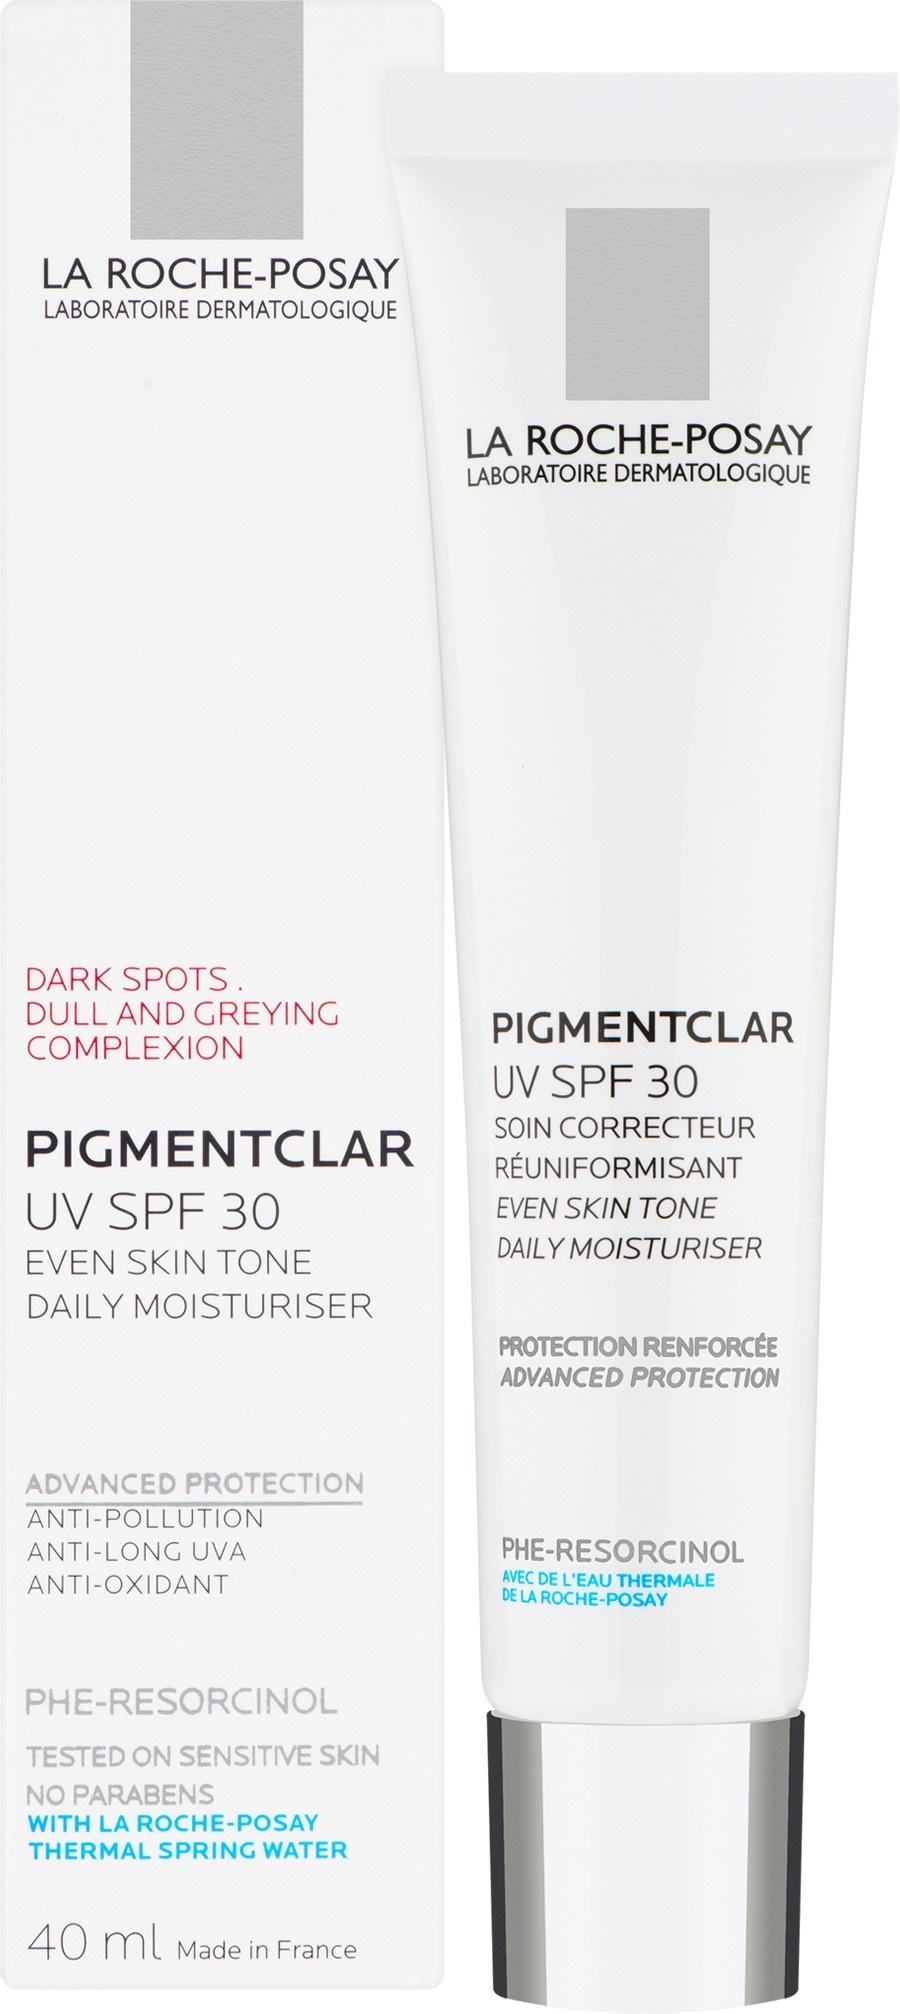 La Roche-Posay Pigmentclar UV SPF30 - Skin Tone Correcting Daily Moisturiser 40ml